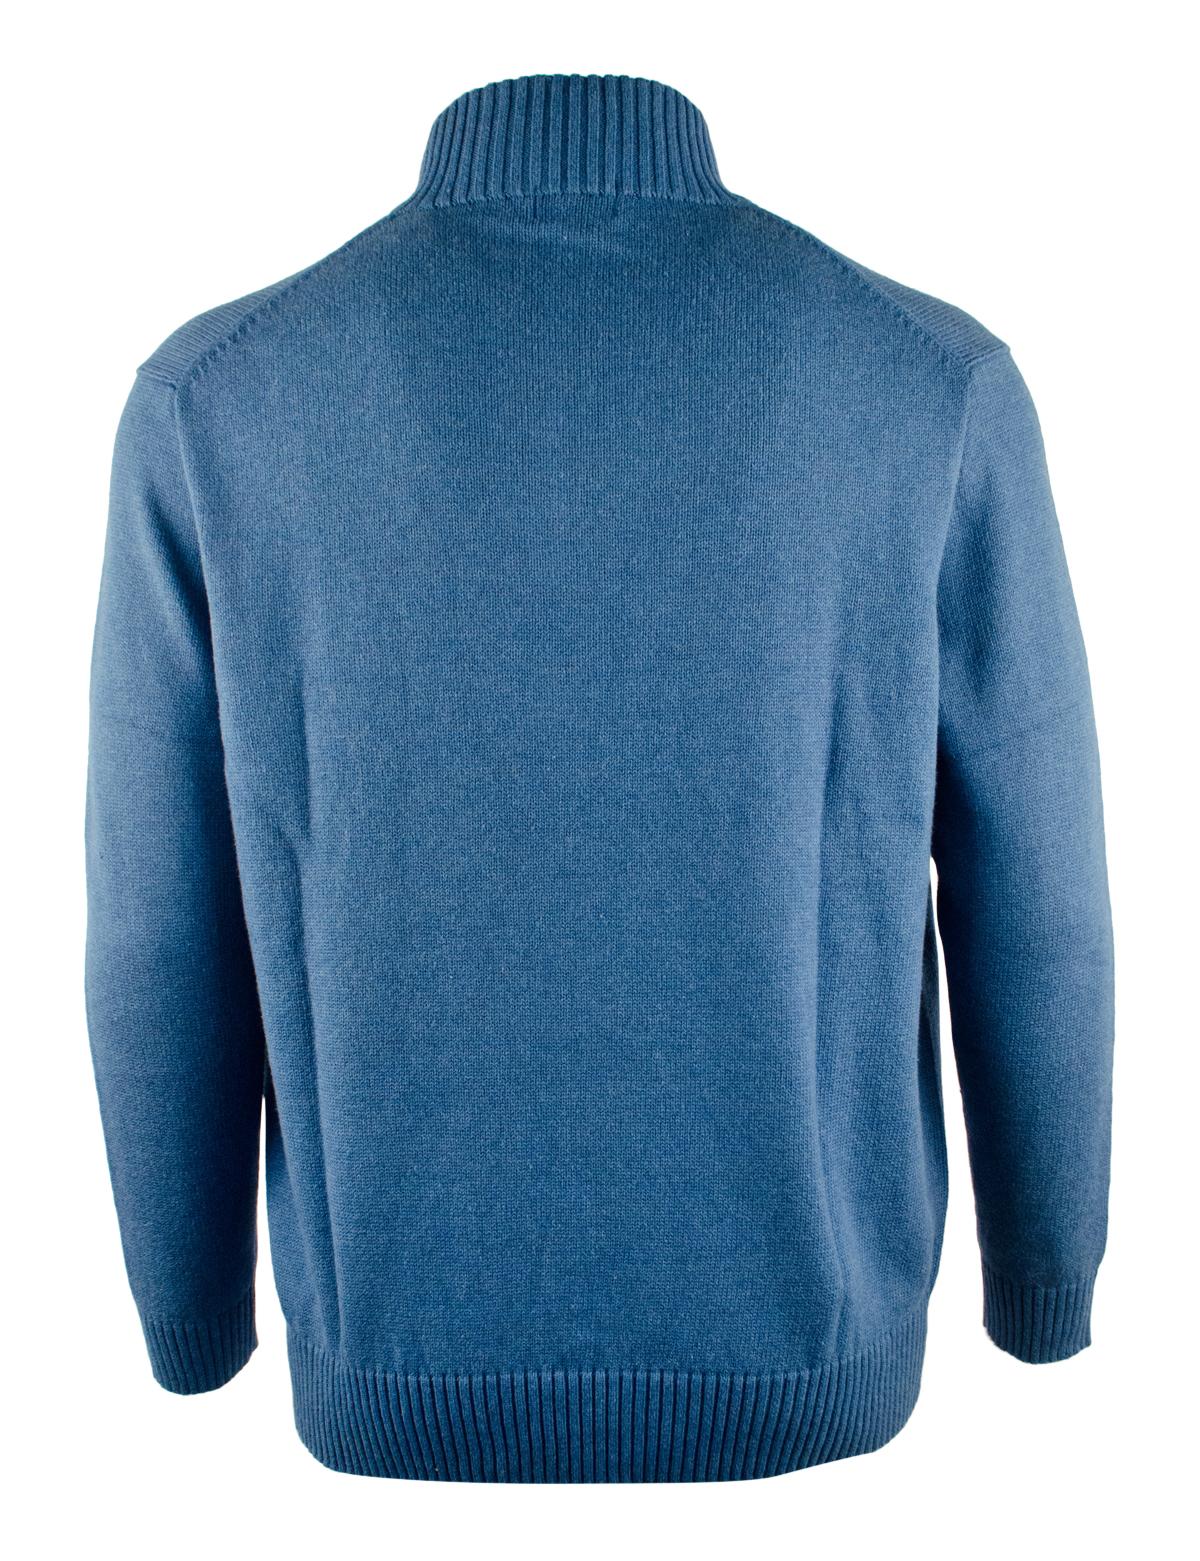 Polo ralph lauren men 39 s big tall half zip mock neck for Big and tall mock turtleneck shirt